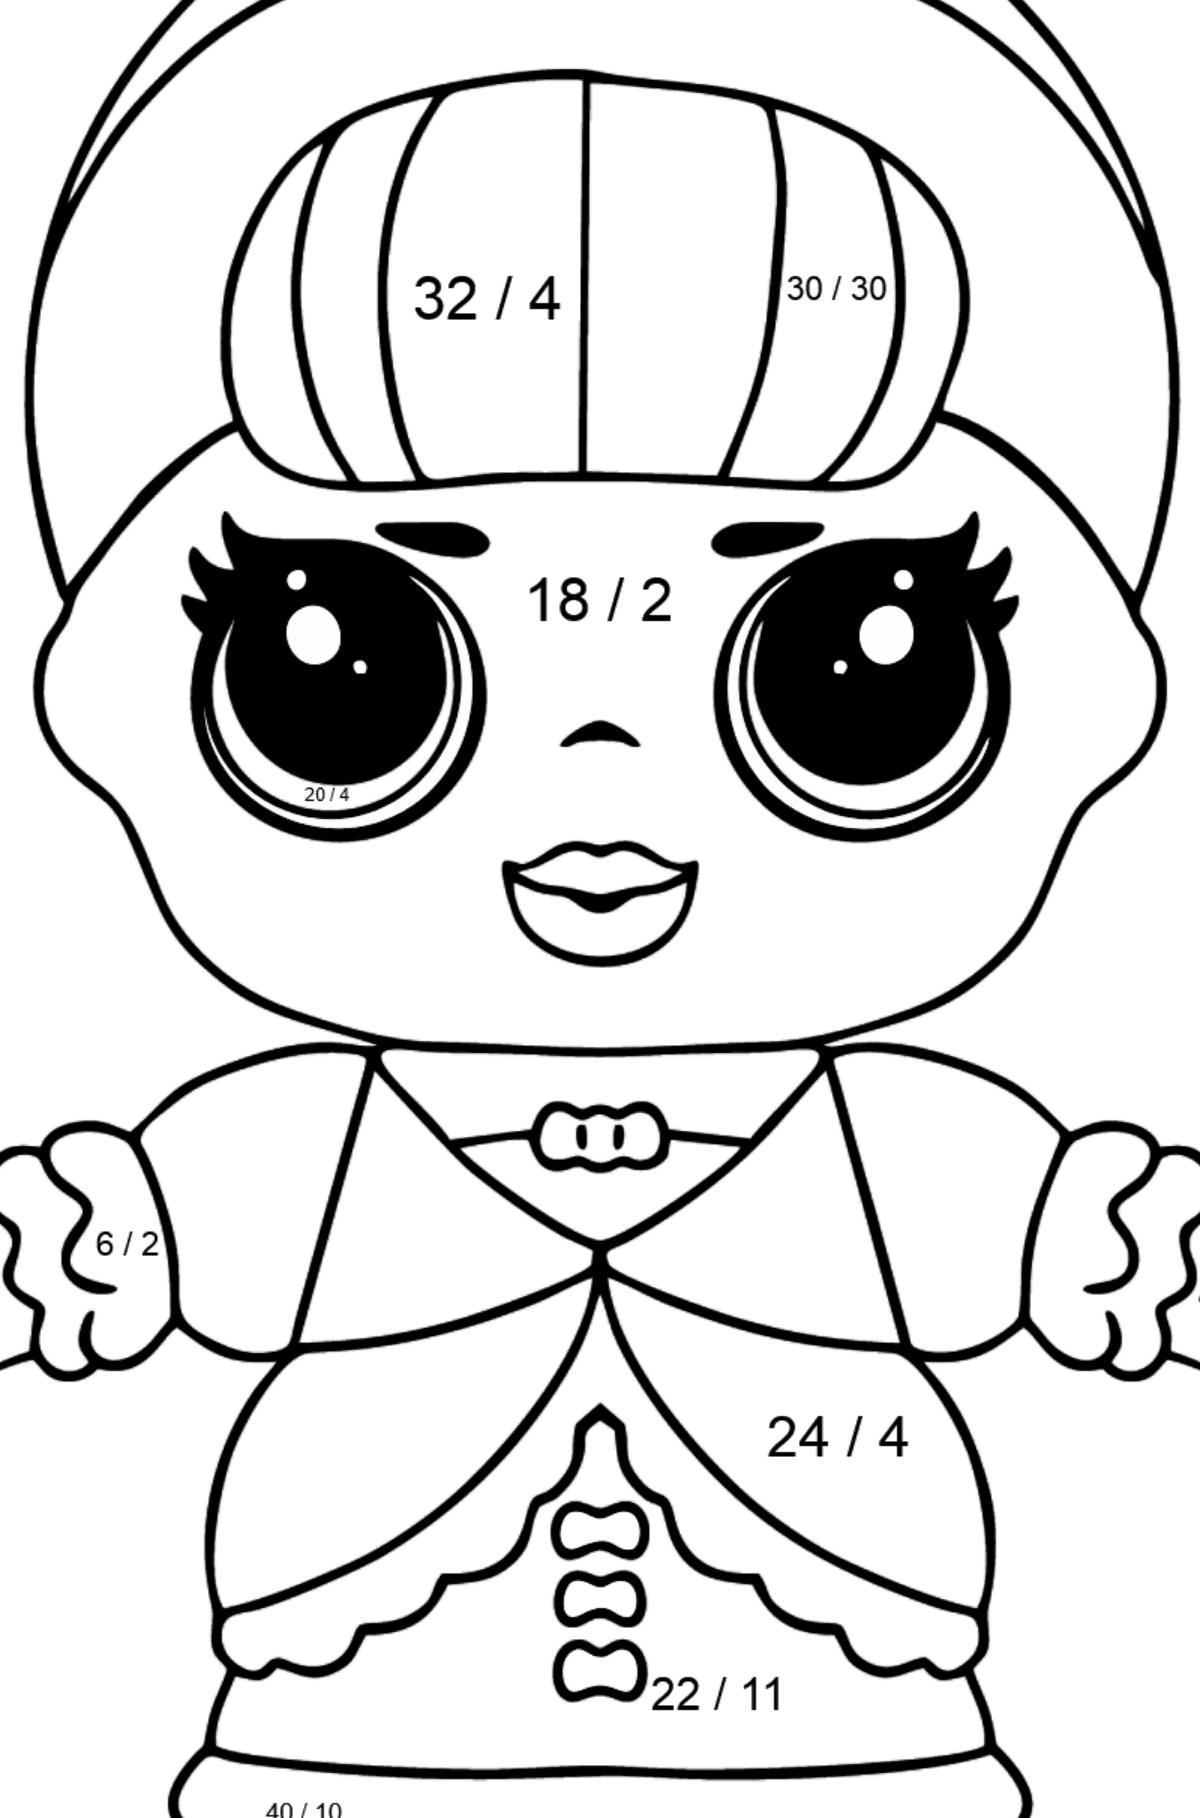 L.O.L. Surprise Doll Fancy - Math Coloring - Division for Kids